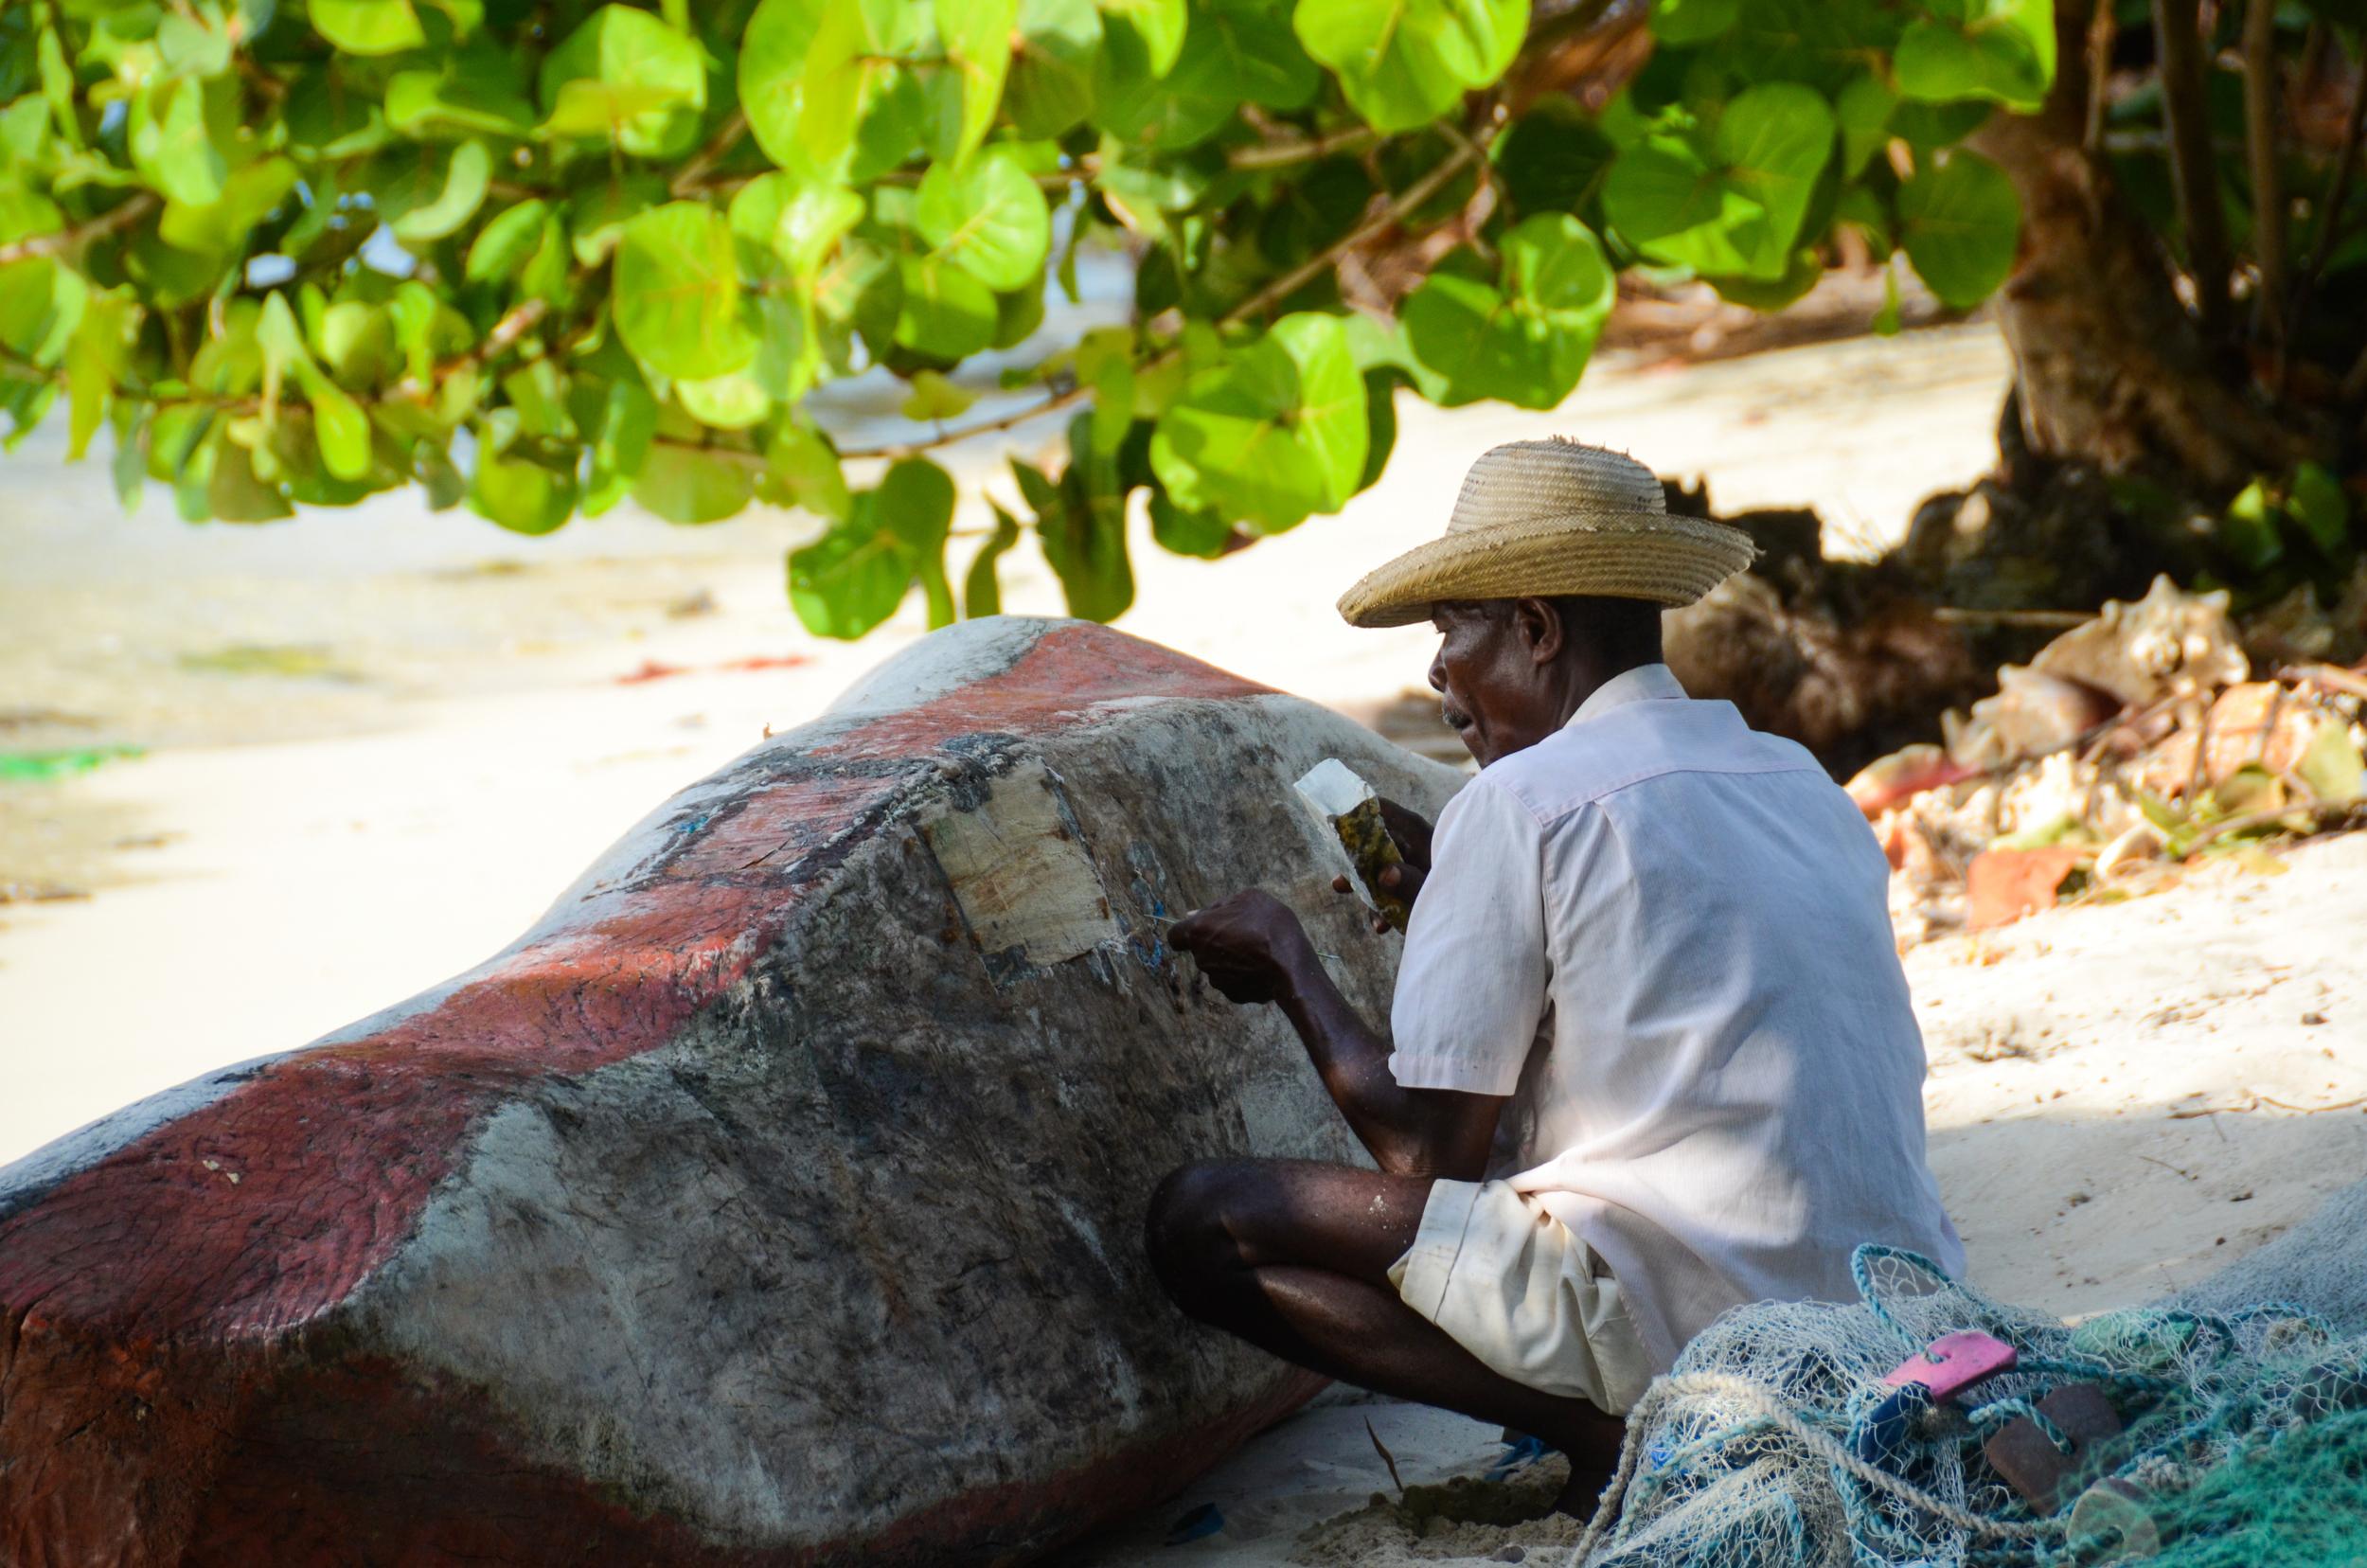 SimonRussellPhotography_Haiti-63.jpg